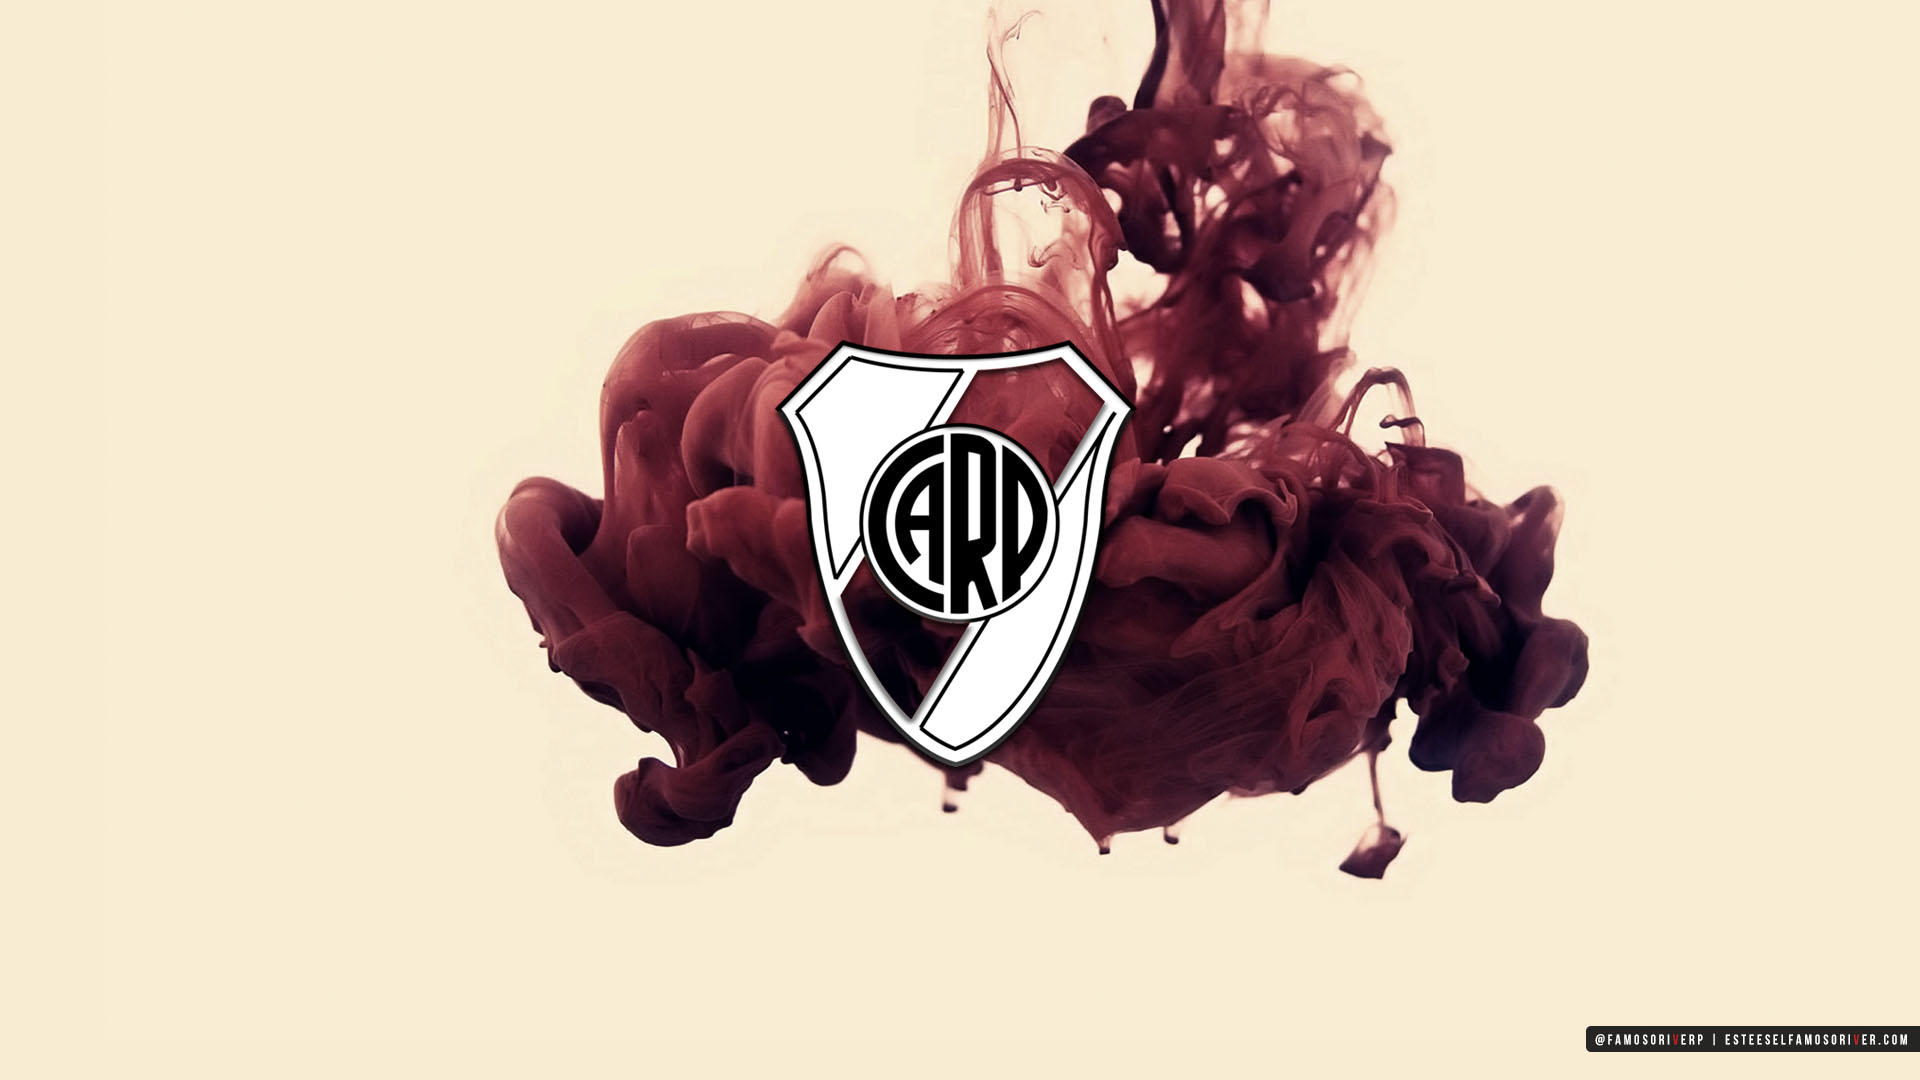 imagenes-de-River-Plate-para-fondos-de-pantalla-wallpaper-de-River-Escudo River Plate sobre tinta roja